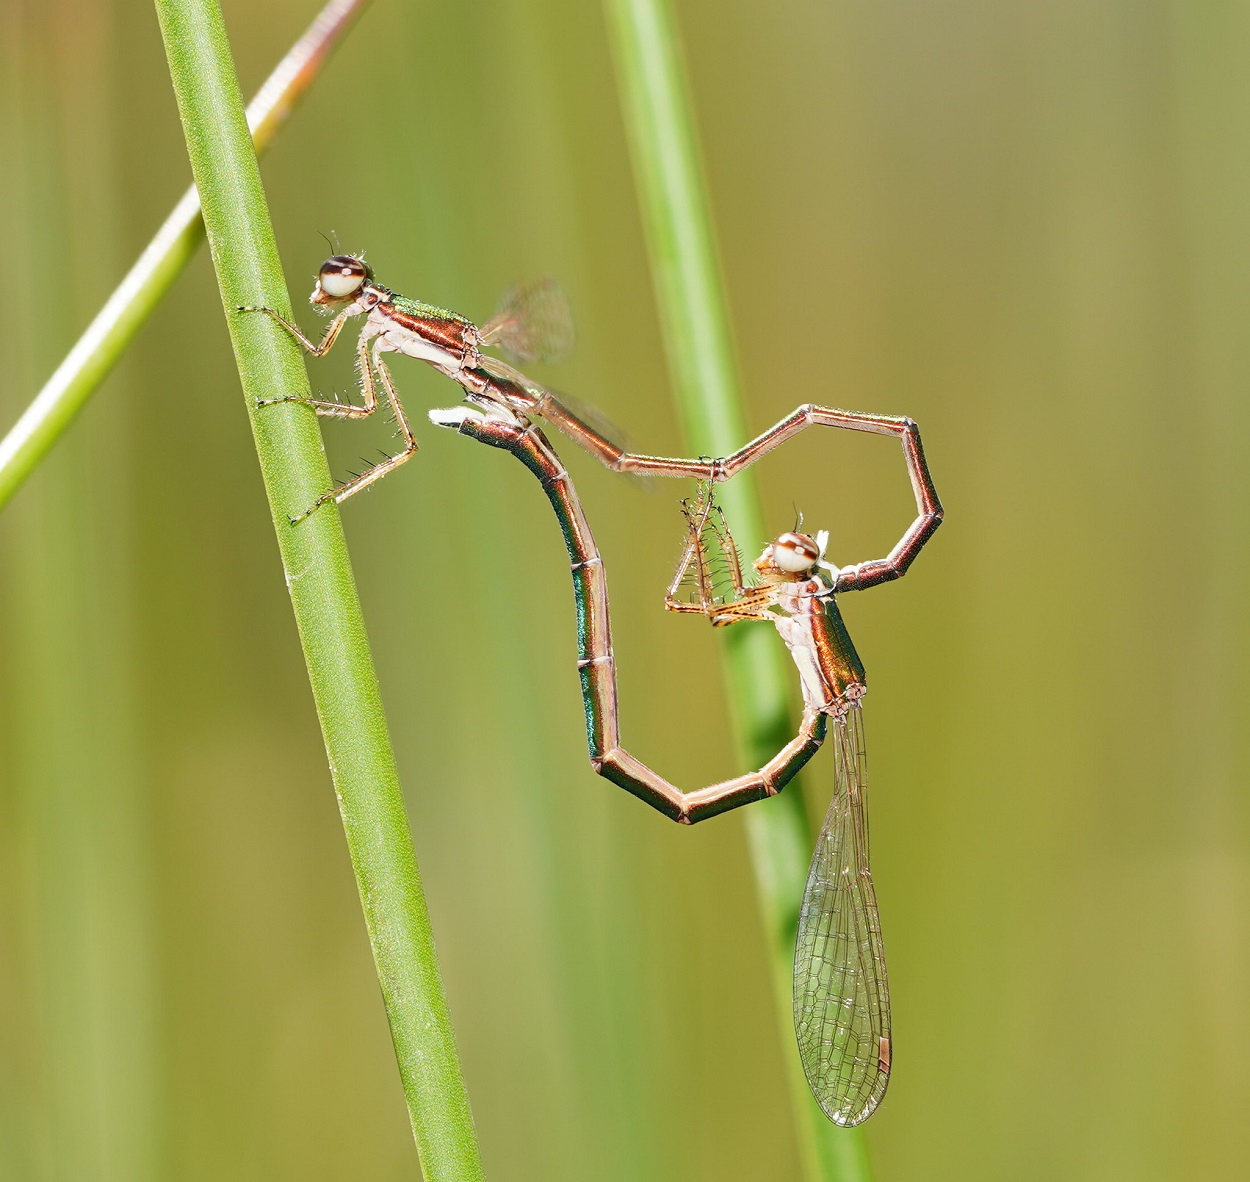 Libélulas Hemiphlebia mirabilis. Reiner Richter, CC BY-NC-SA